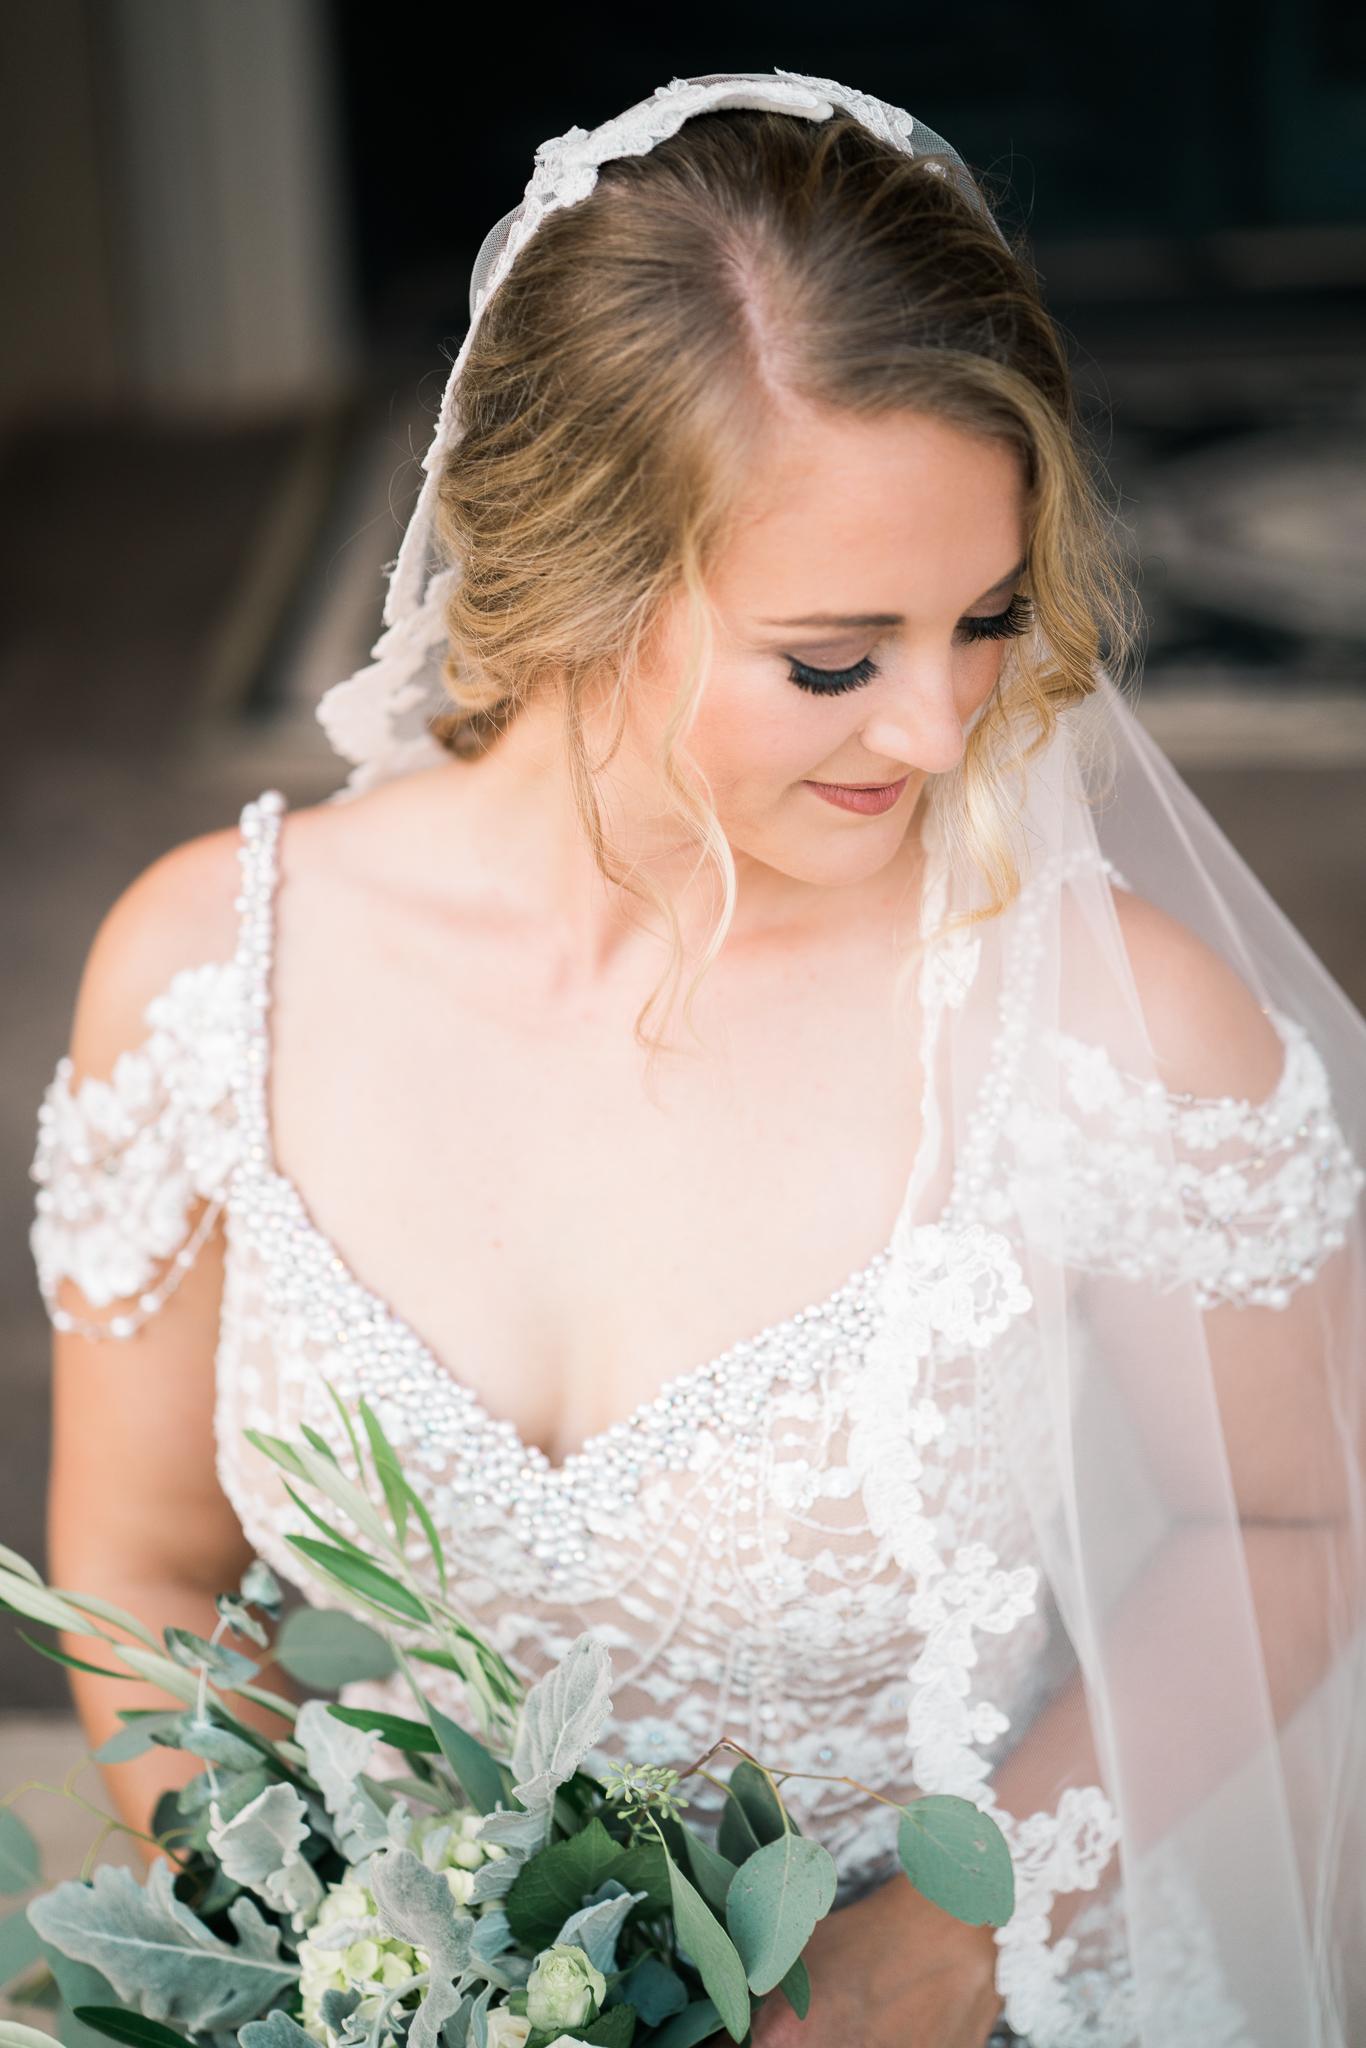 Clytee-Bridal-Portraits-Web-65.jpg